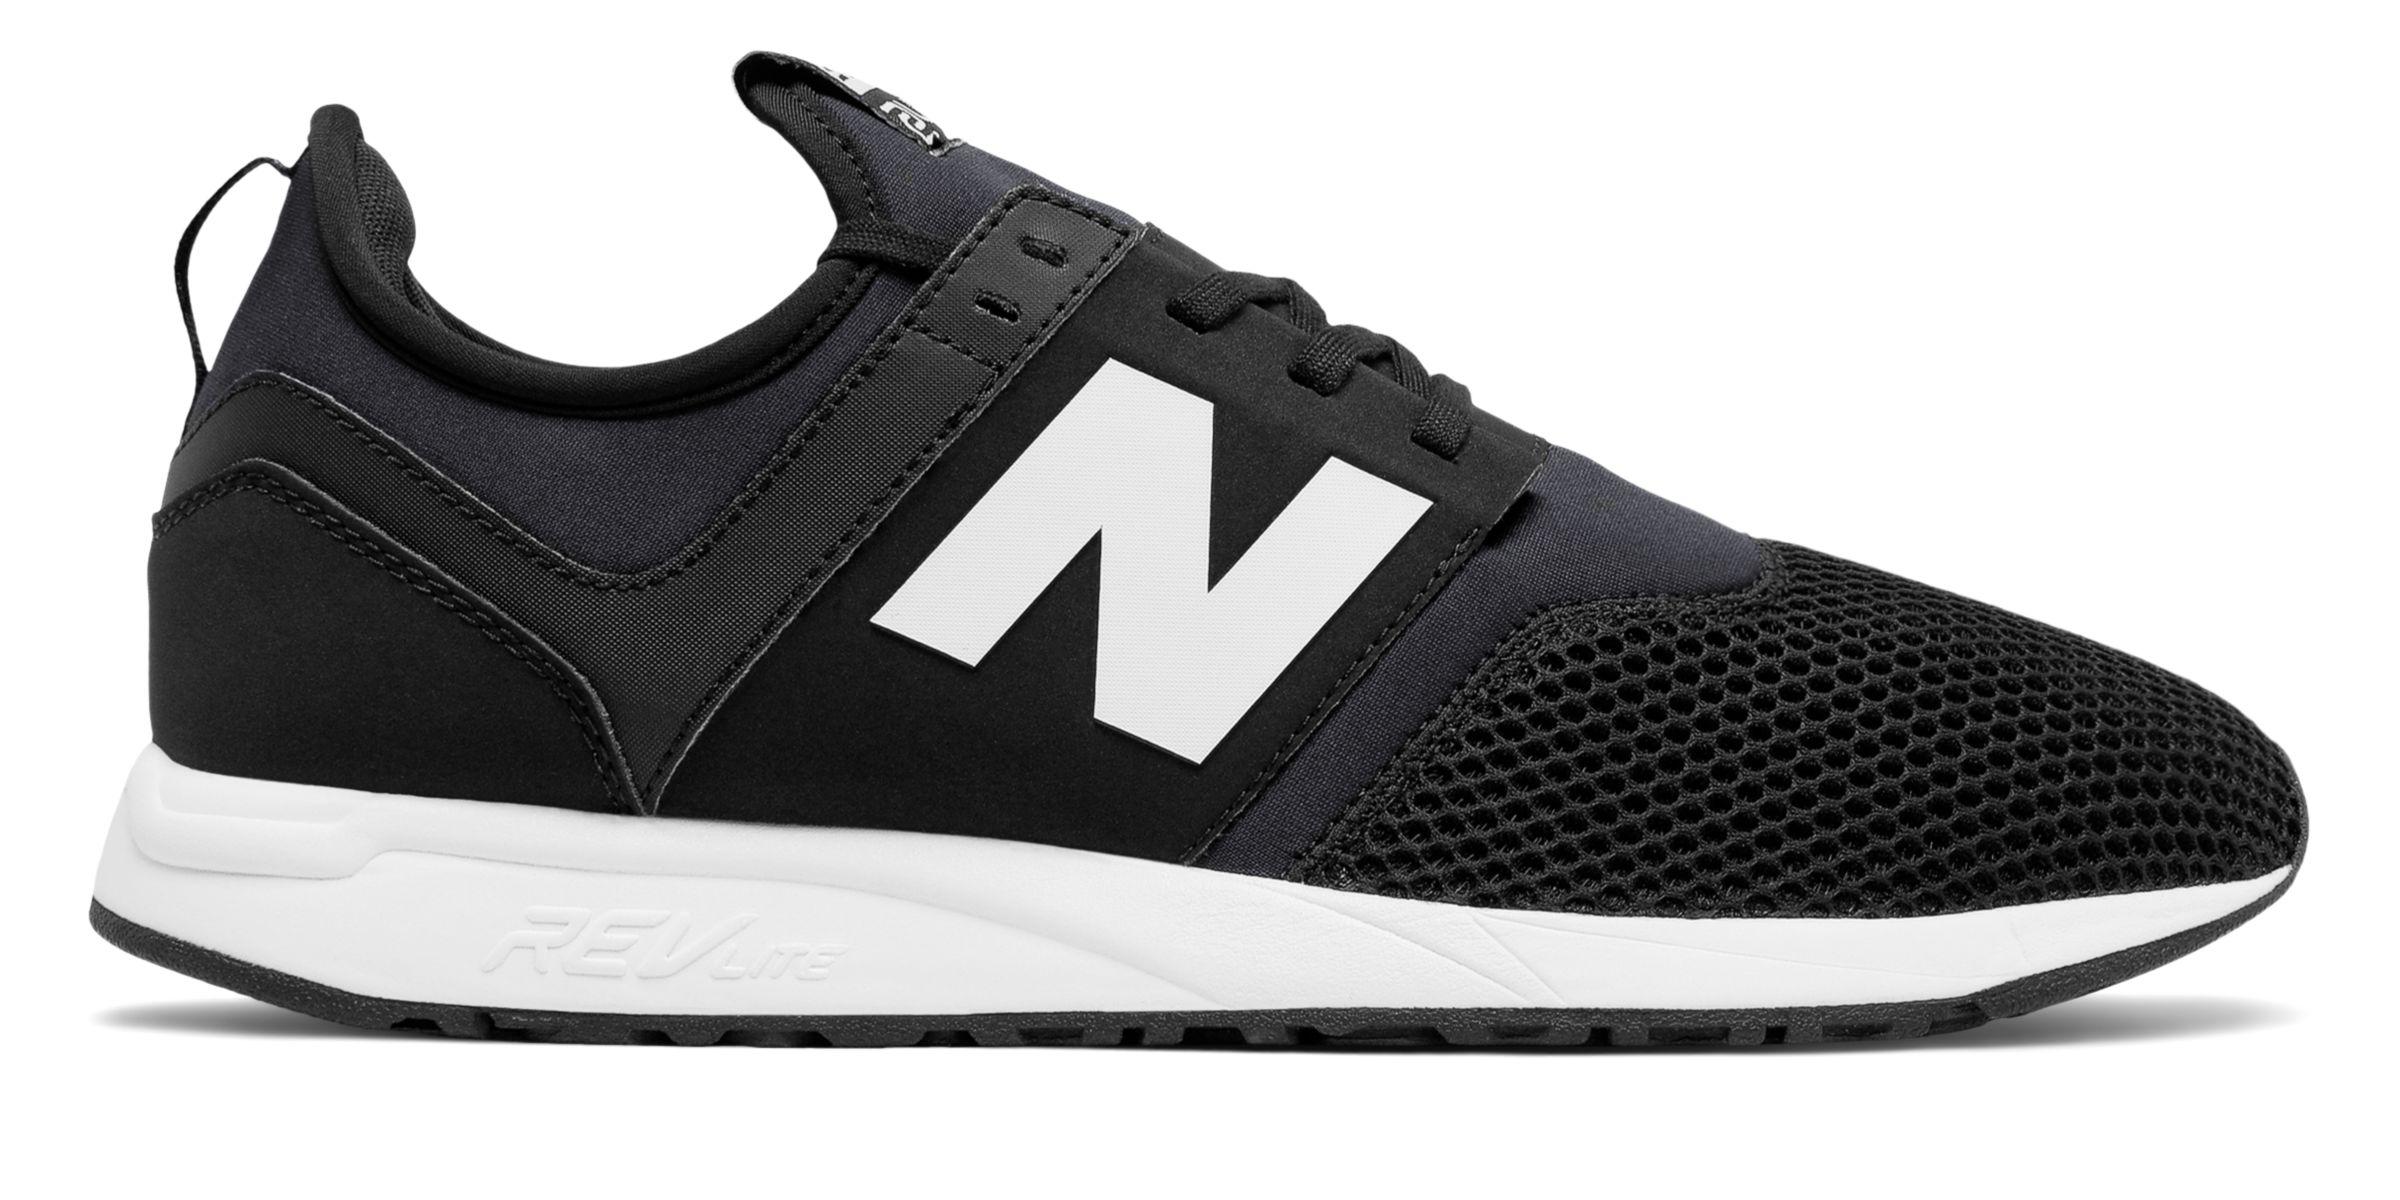 NB 247 Classic, Black with Dark Grey